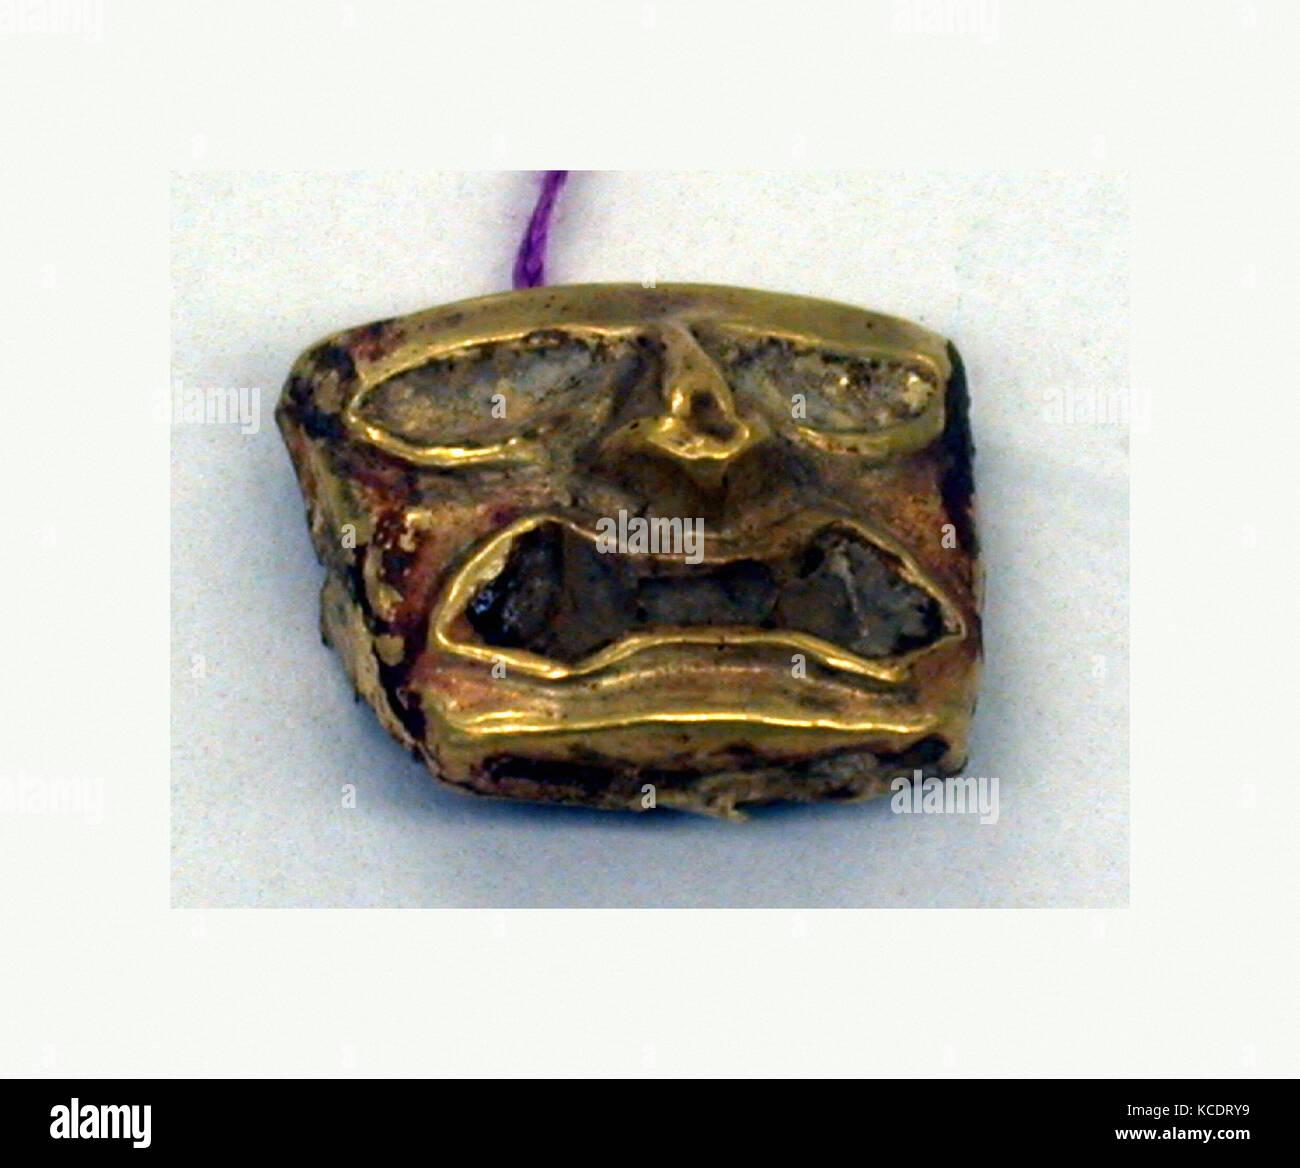 Gold Face Mask Ornament, 390–450, Peru, Moche (Loma Negra), Gold, H x W: 1/2 x 5/8in. (1.3 x 1.6cm), Metal-Ornaments - Stock Image